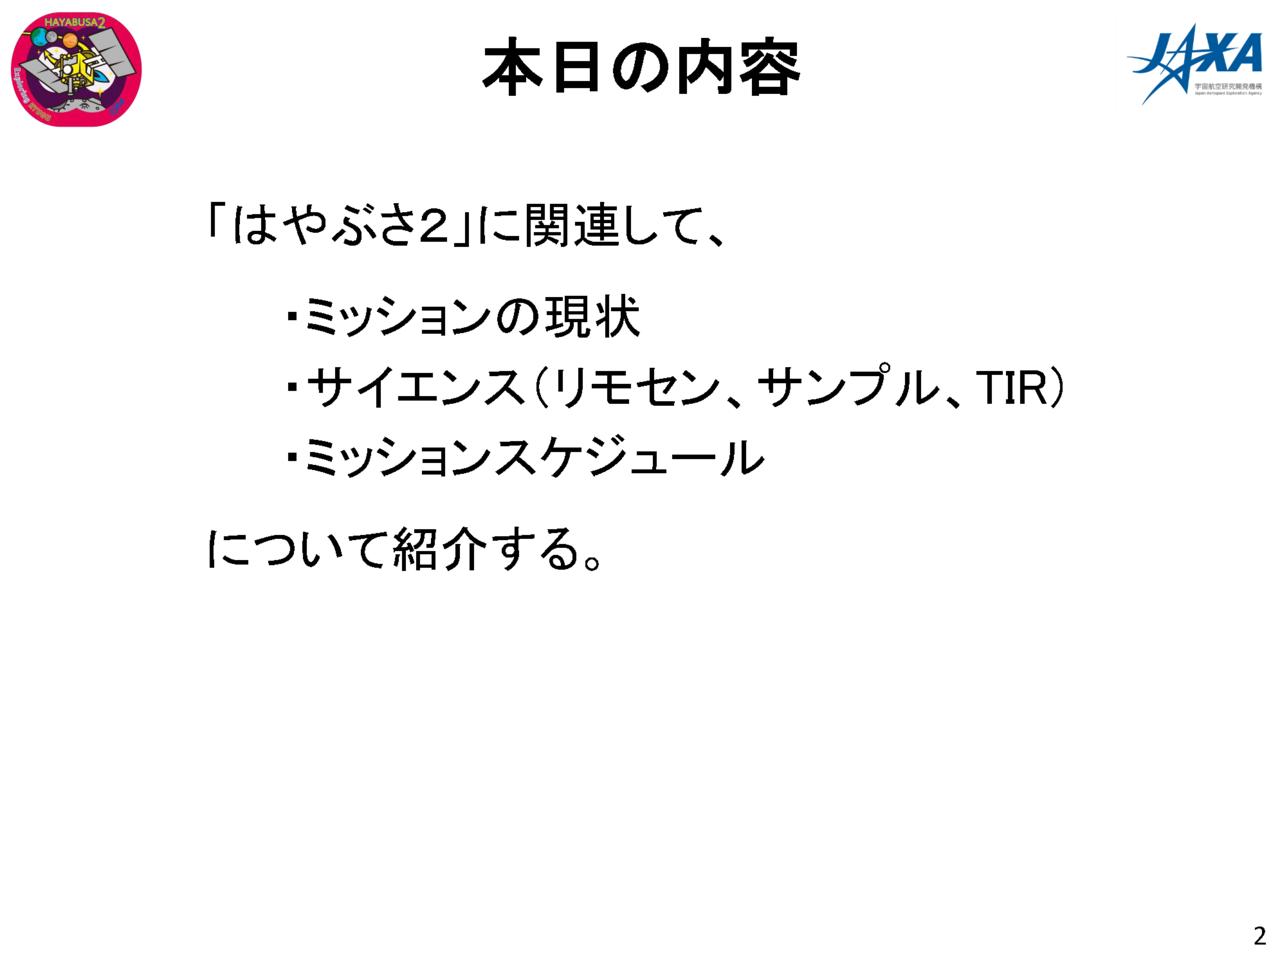 f:id:Imamura:20180719131657p:plain